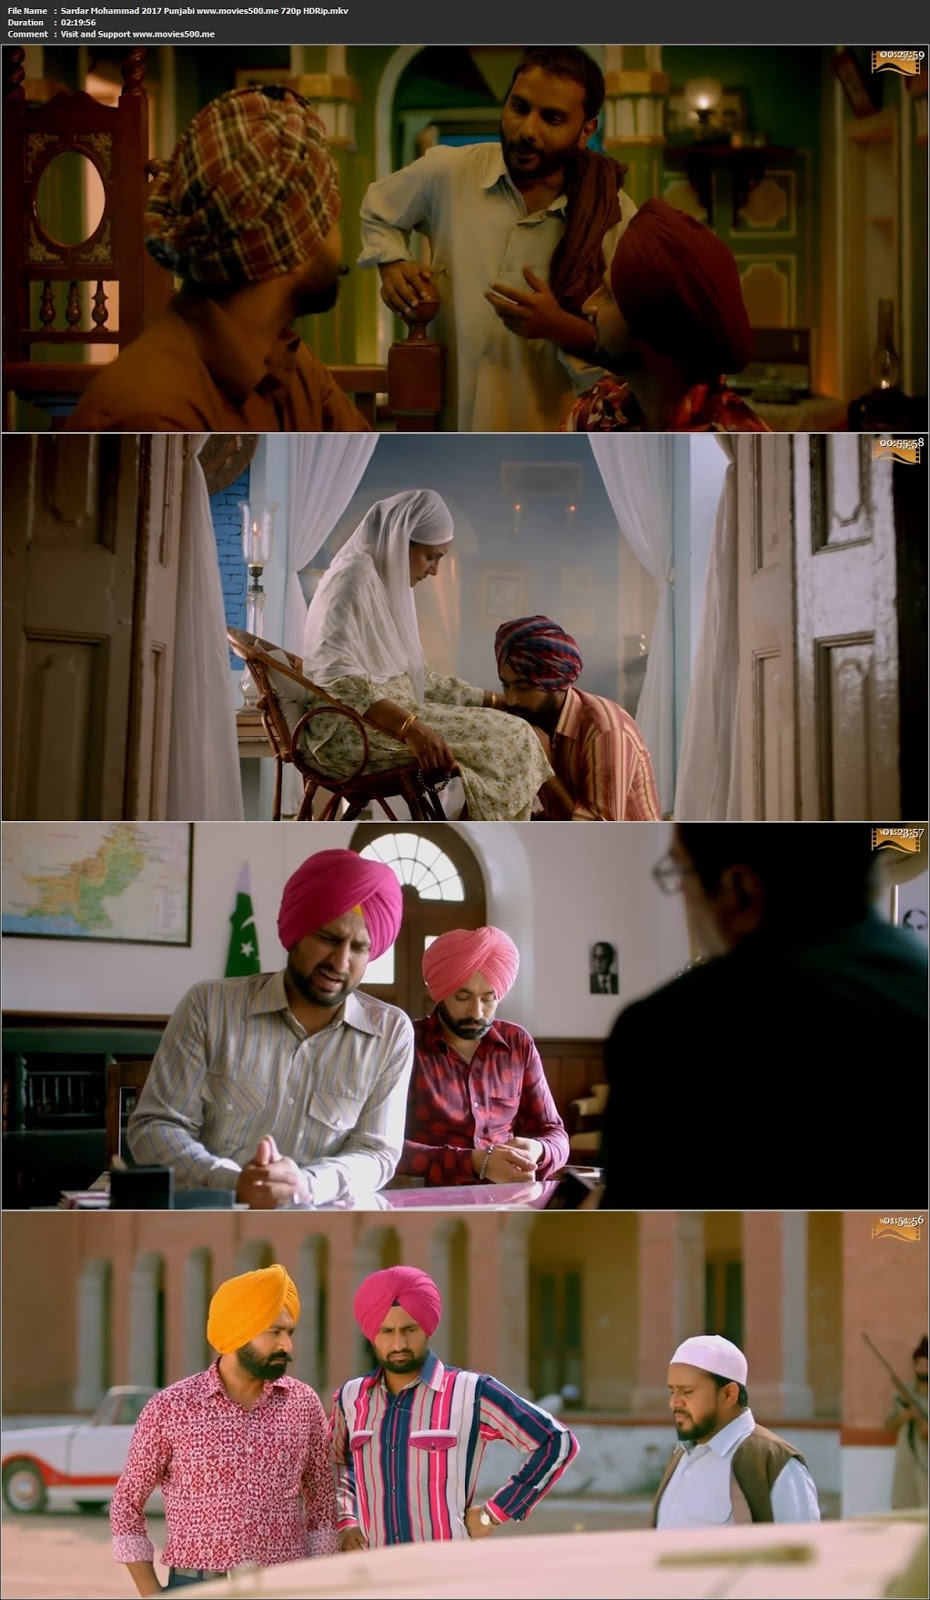 Sardar Mohammad 2017 Punjabi Full Movie HDRip 720p at xn--o9jyb9aa09c103qnhe3m5i.com